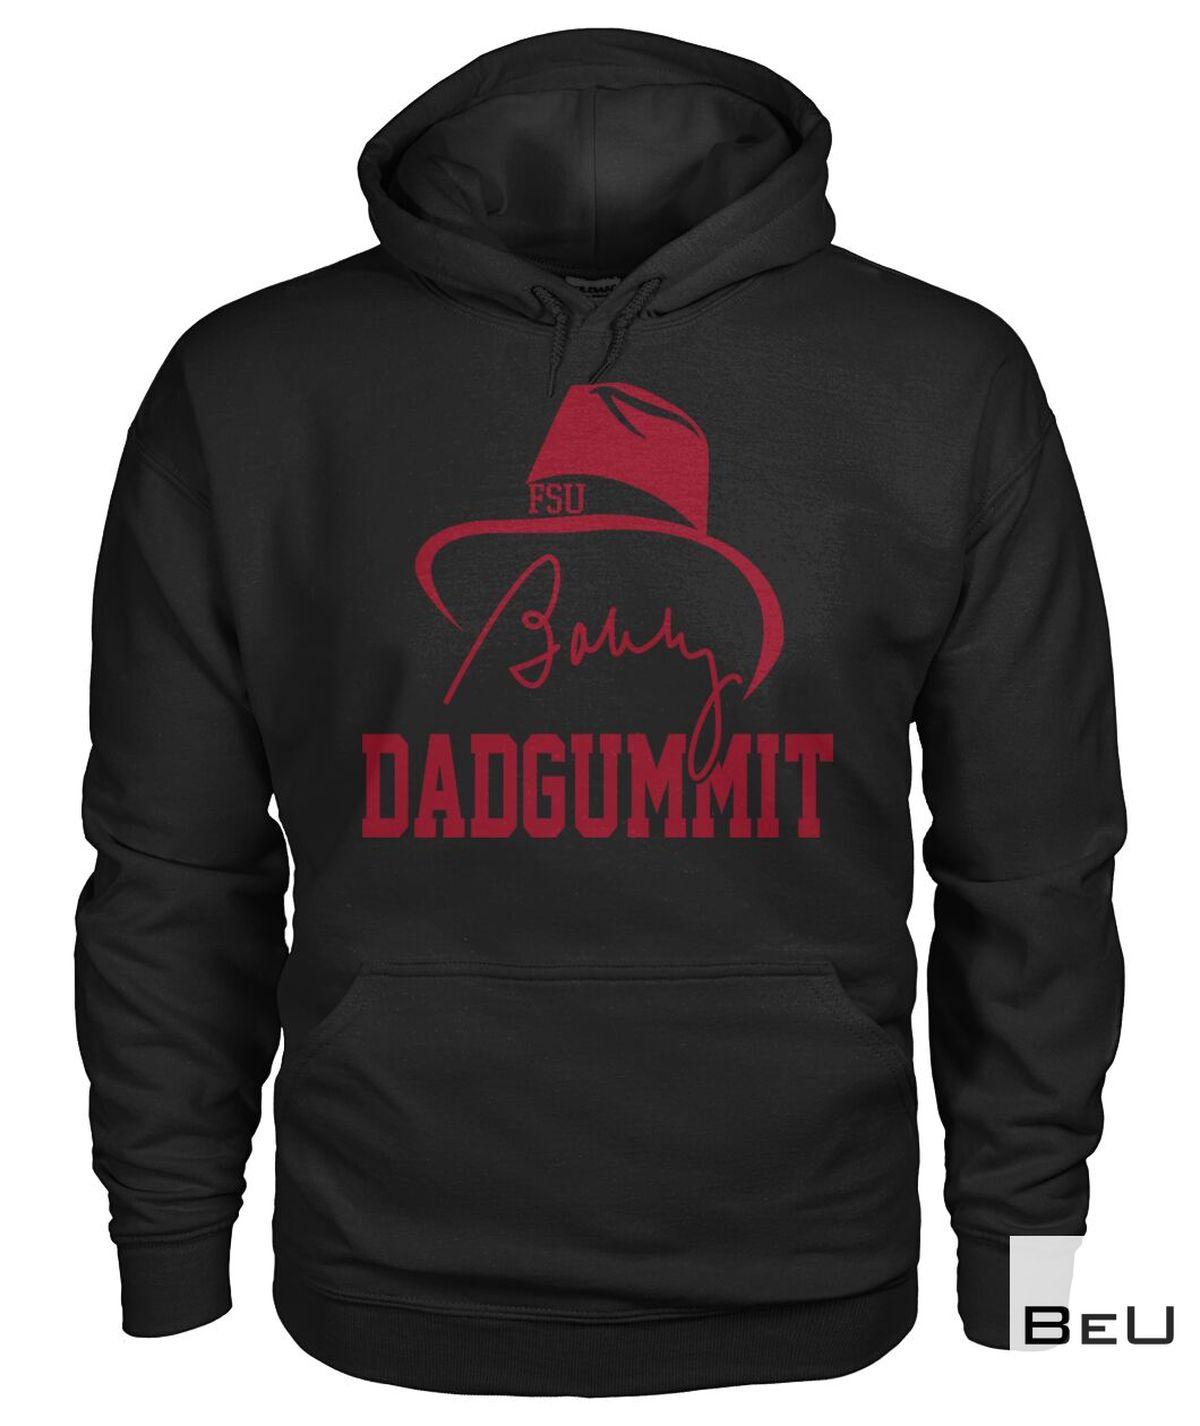 Handmade FSU Bowly Dadgummit Shirt, hoodie, tank top